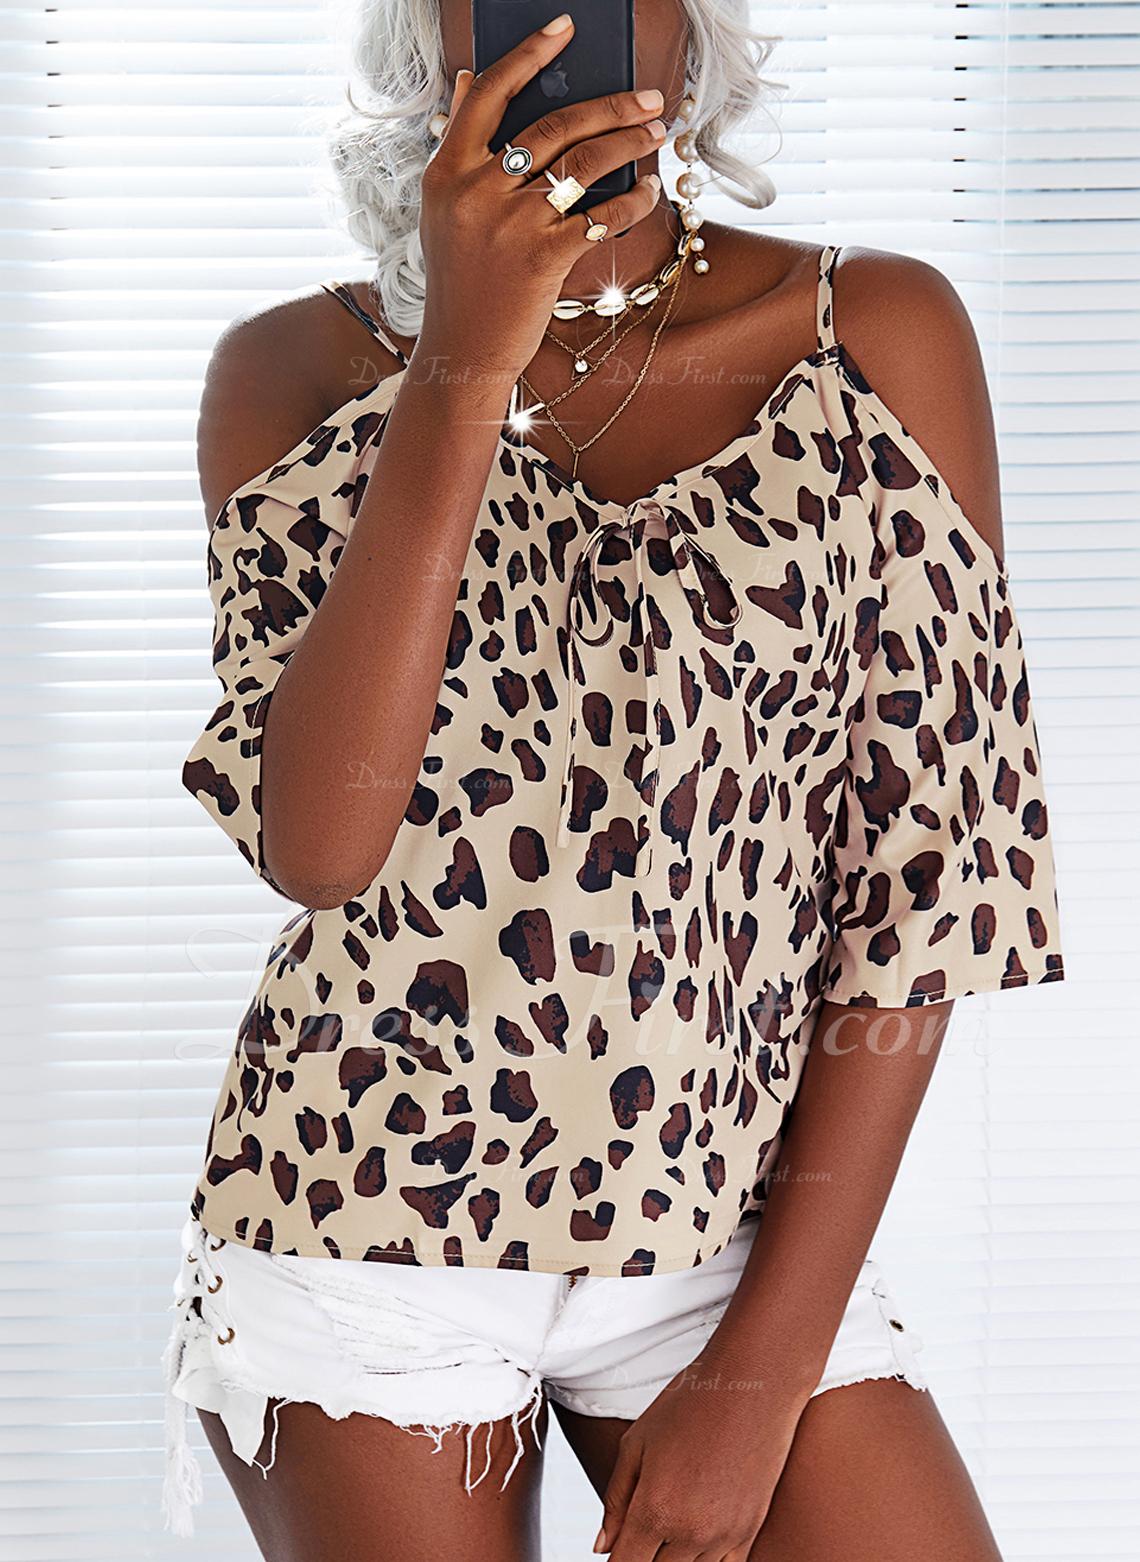 Leopardo Top Con Hombros Mangas 3/4 Casual Blusas